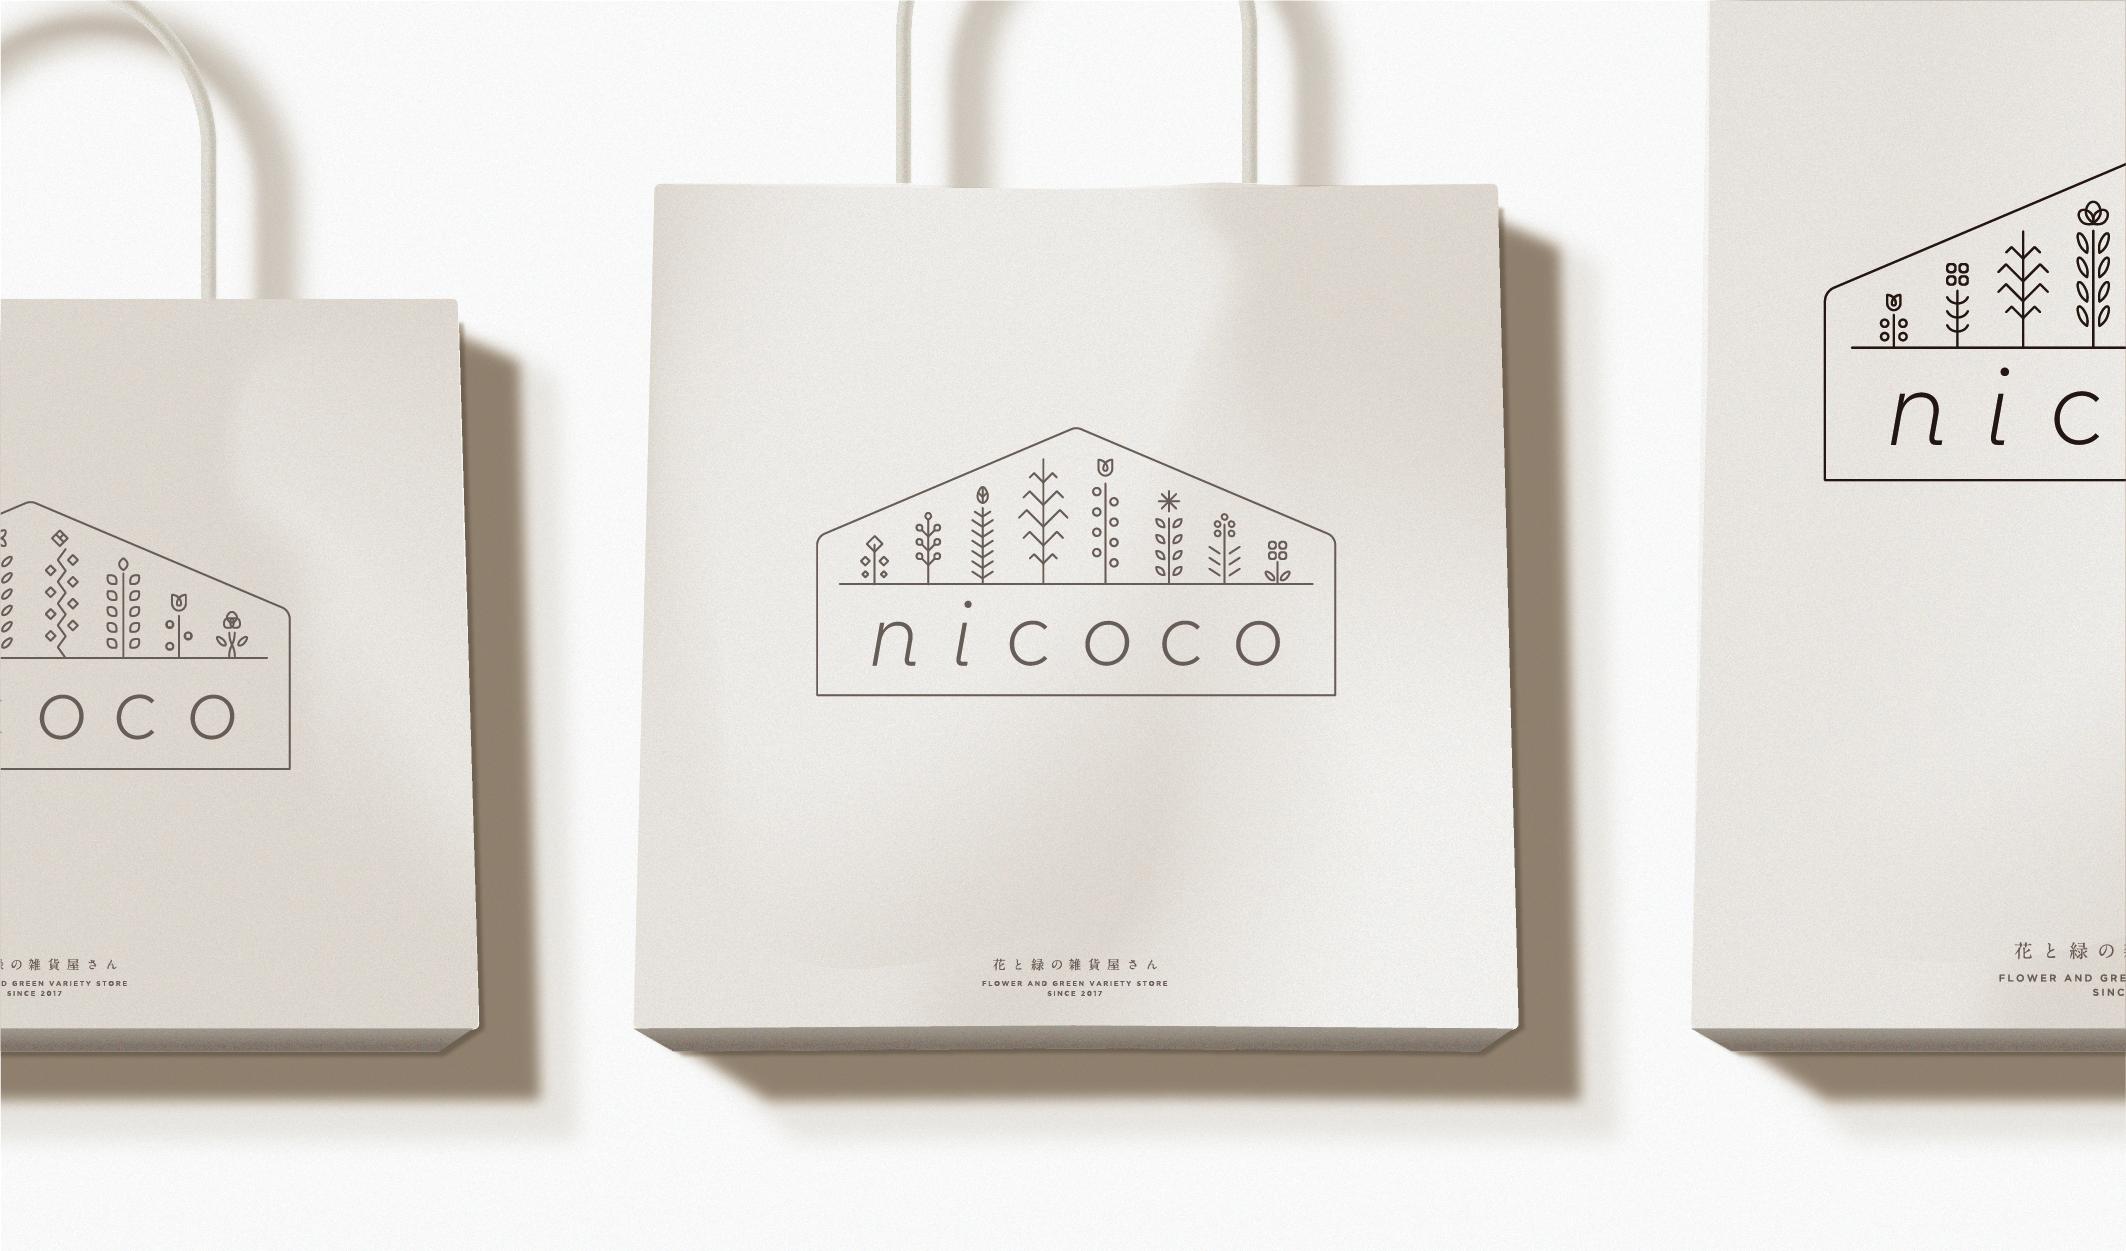 nicoco image4